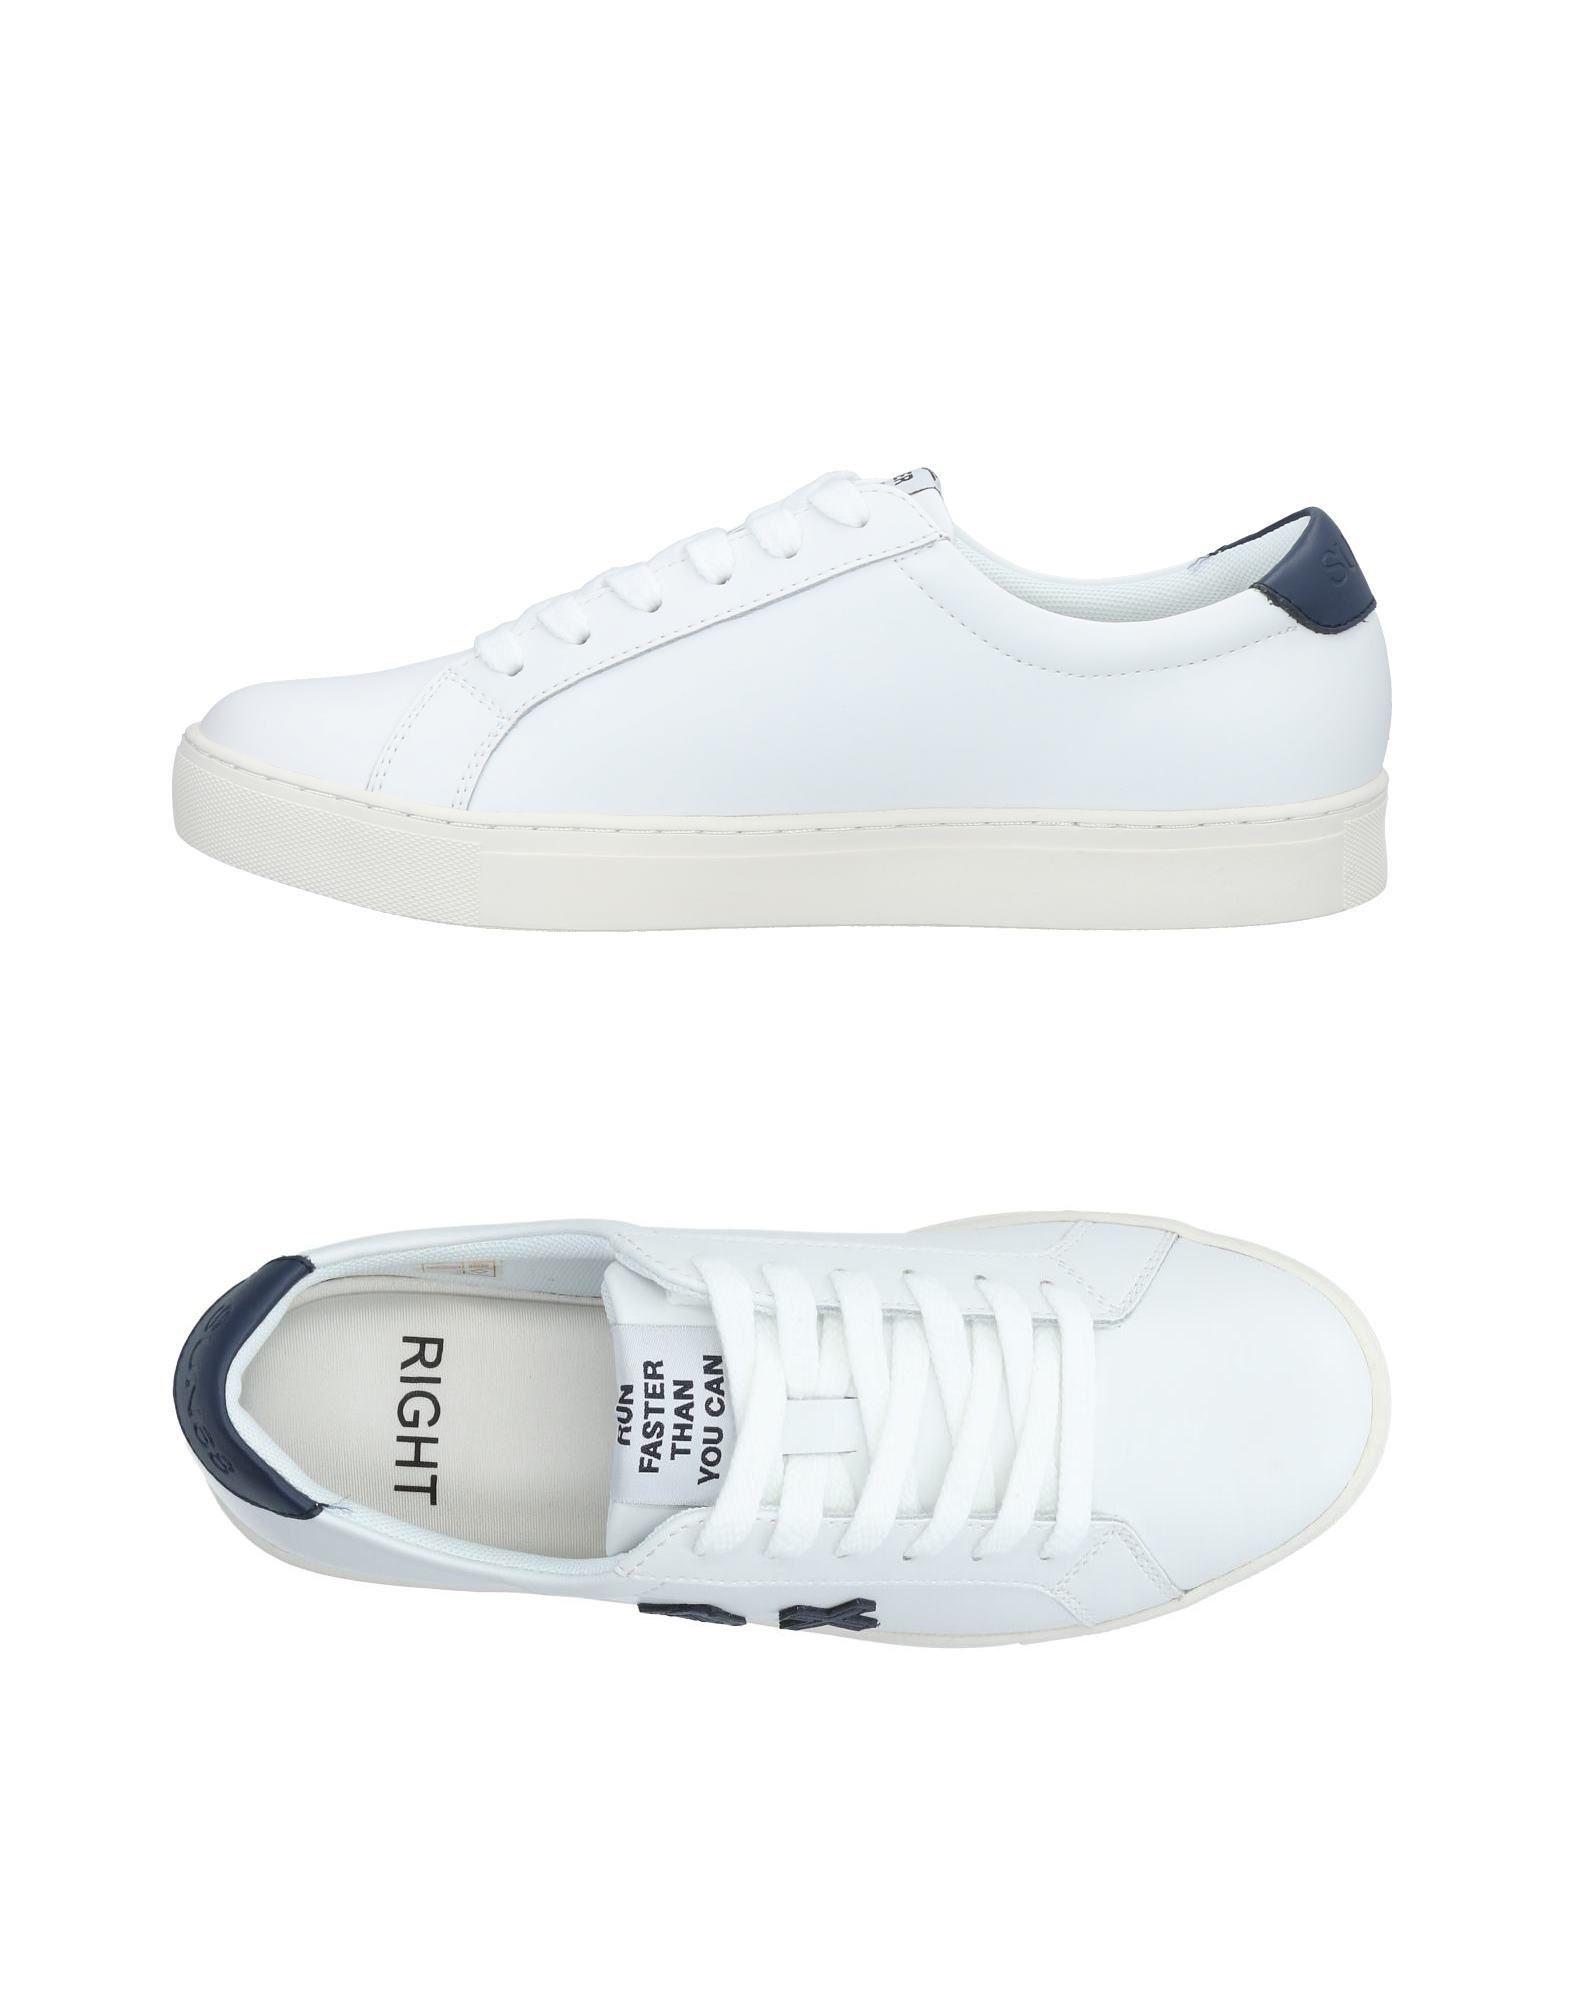 Sneakers Sun 68 Homme - Sneakers Sun 68  Blanc Mode pas cher et belle